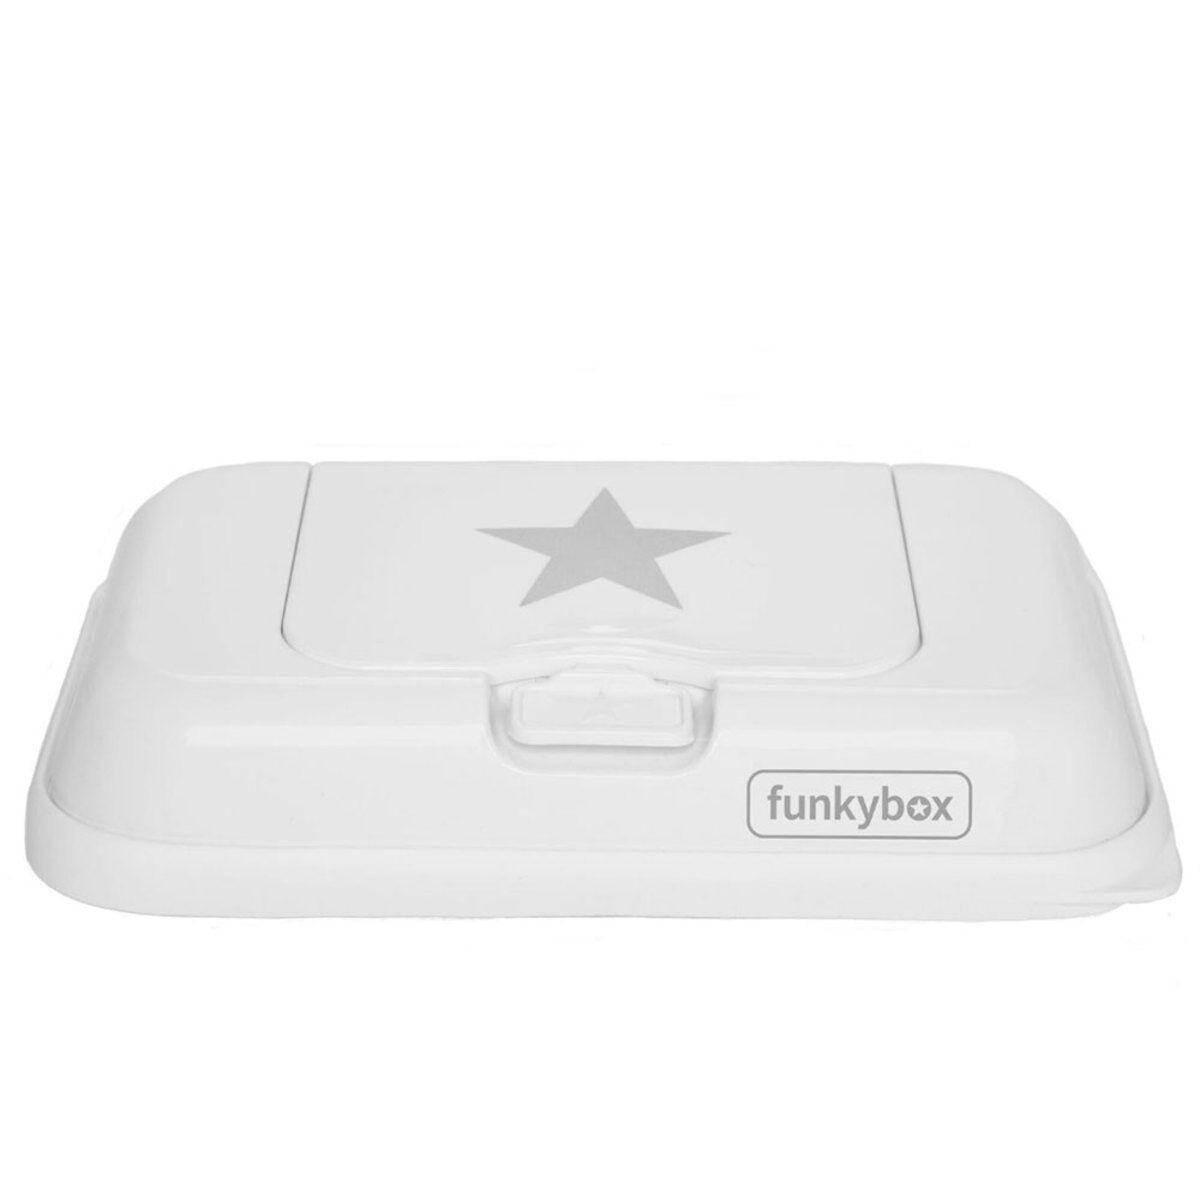 Funkybox Boîte Lingettes Nomade Blanc Etoile Argent